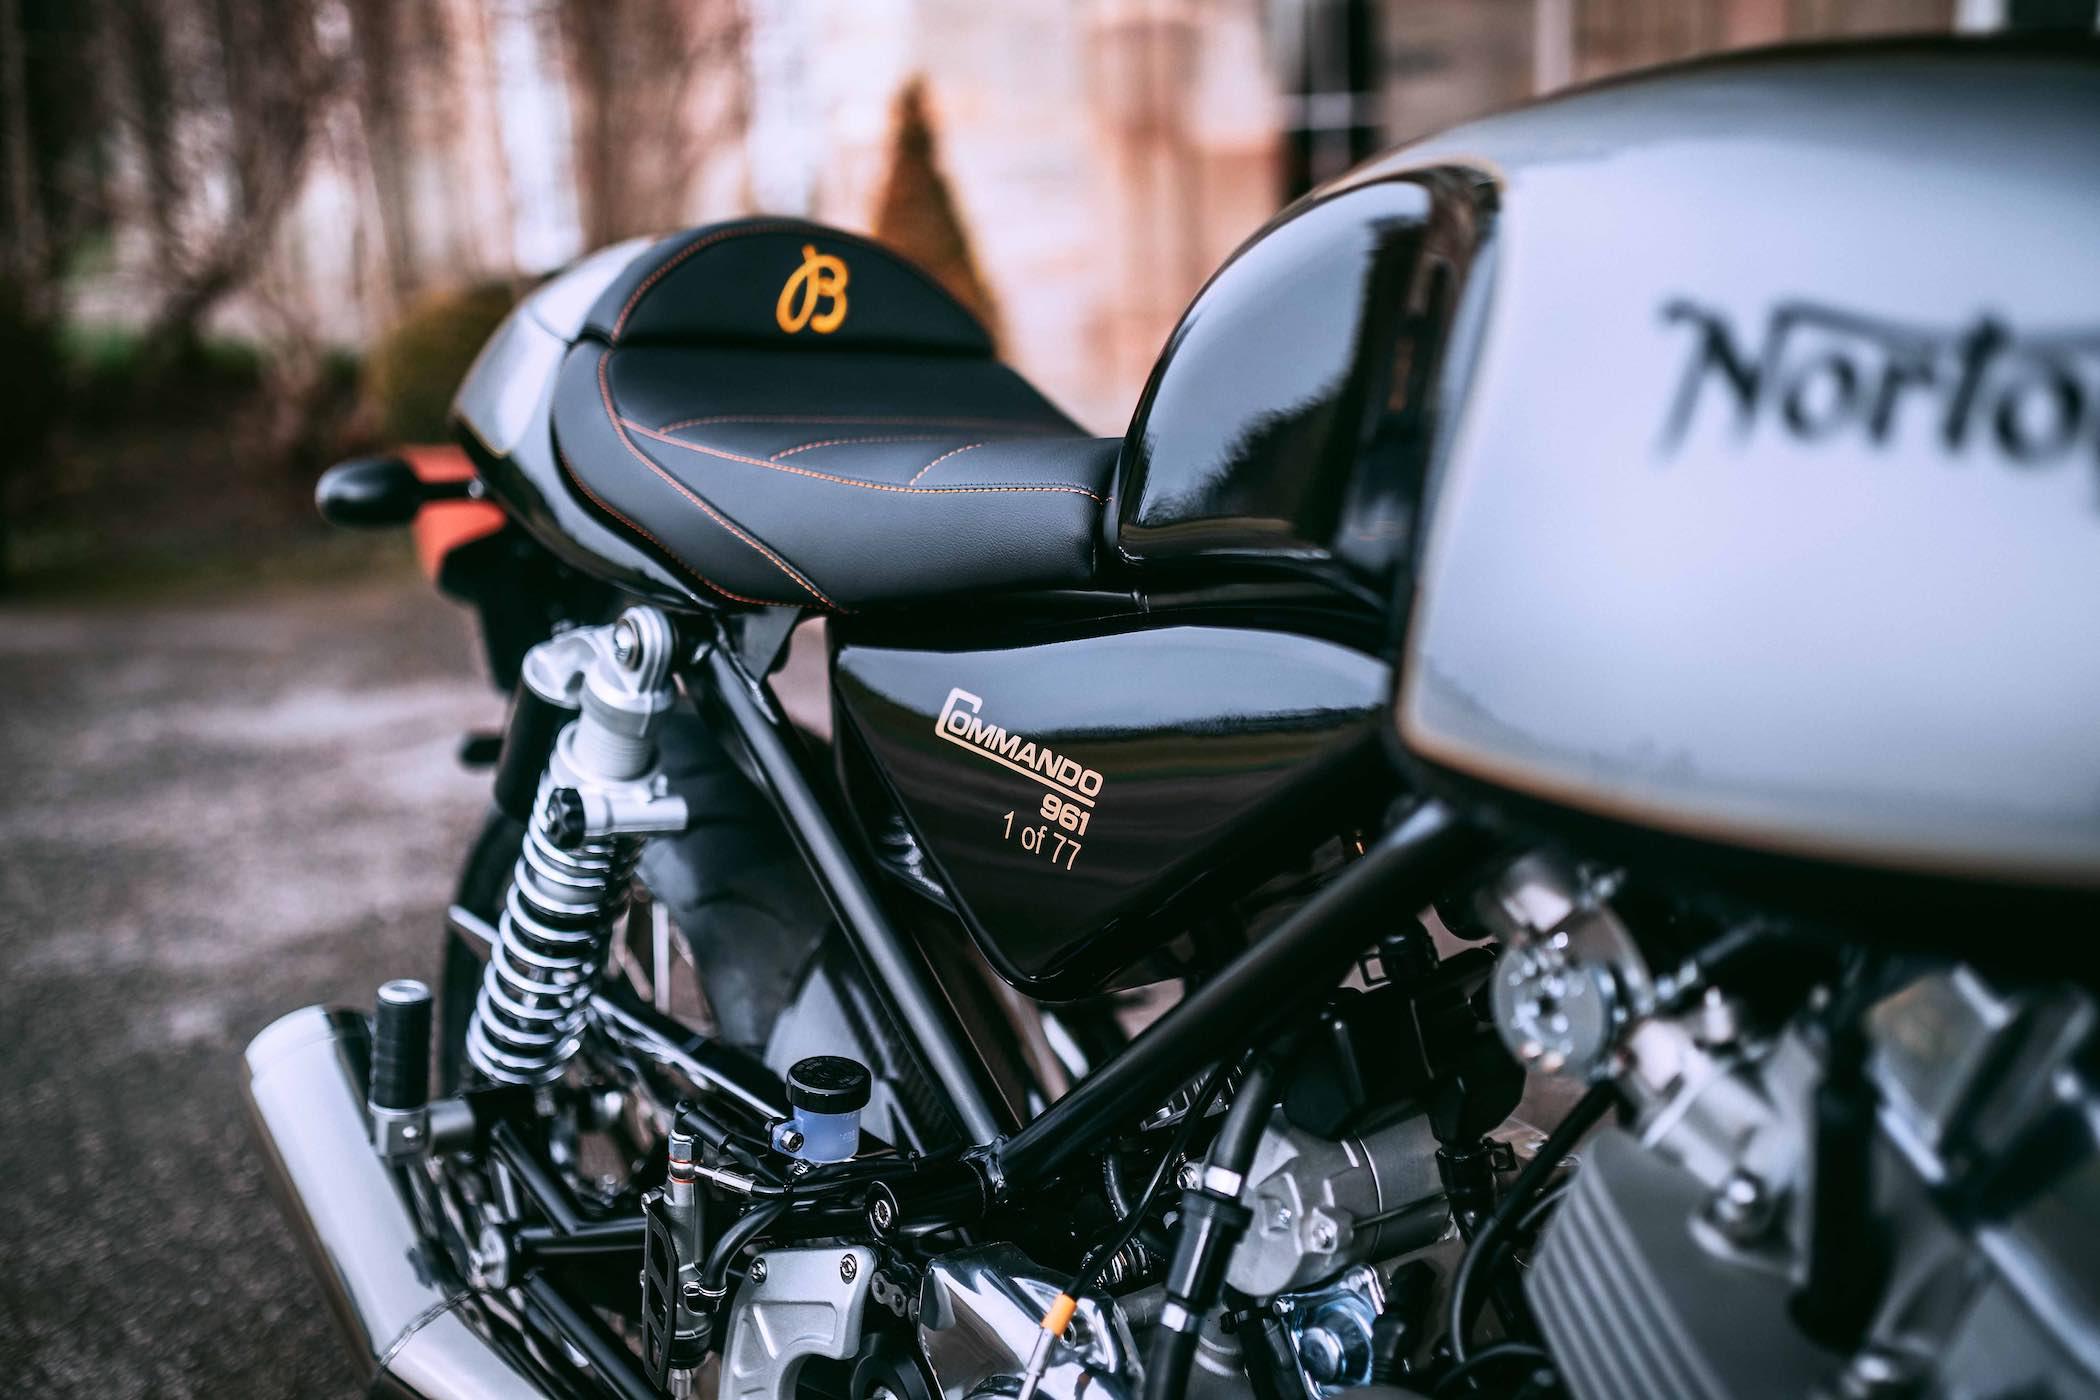 Norton Commando 961 Café Racer MKII Breitling Limited Edition Motorcycle